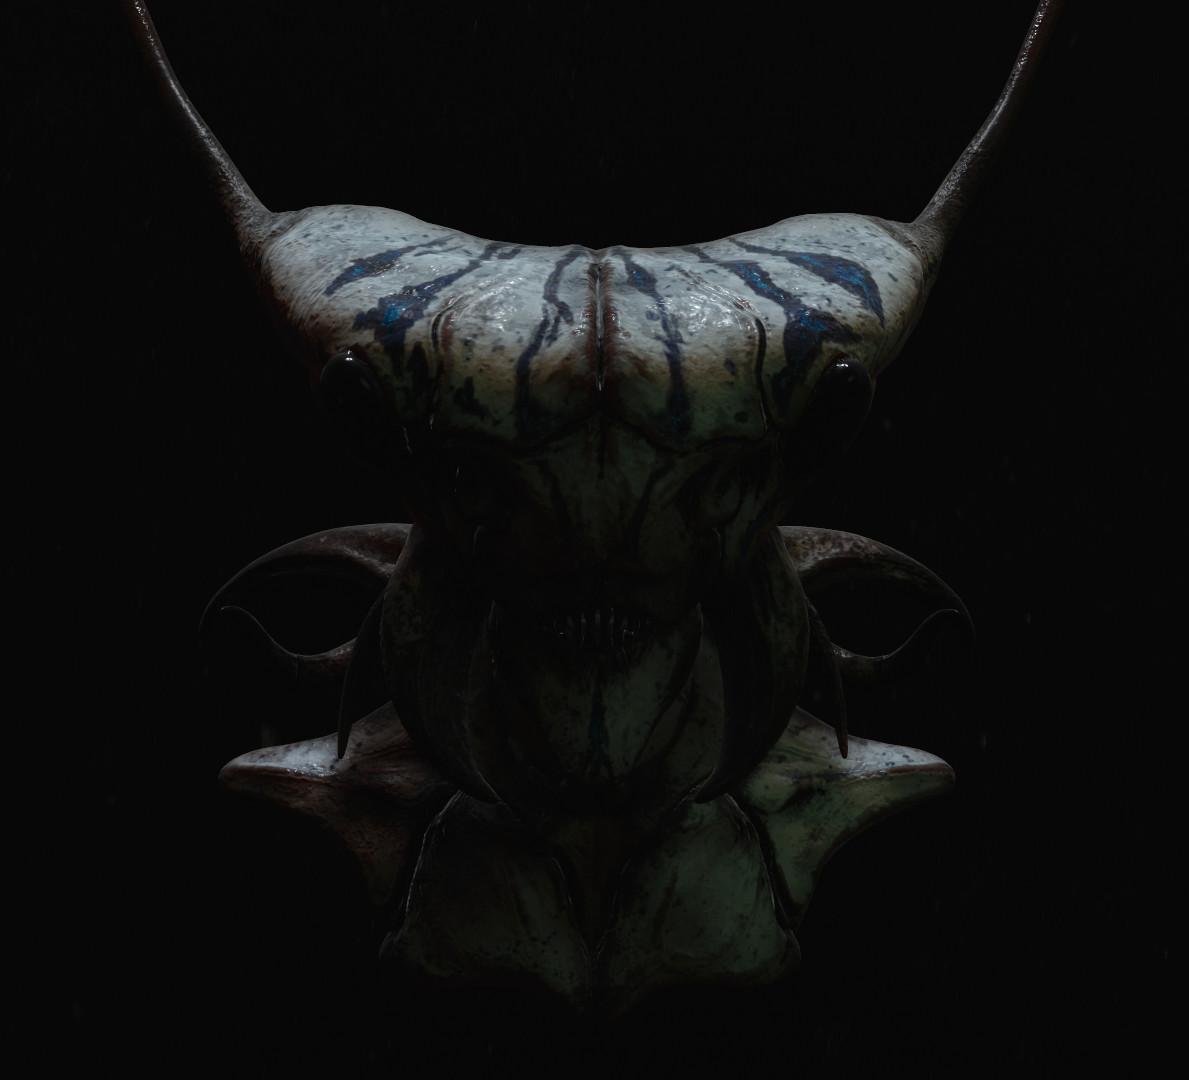 Pablo munoz gomez insectoid 01